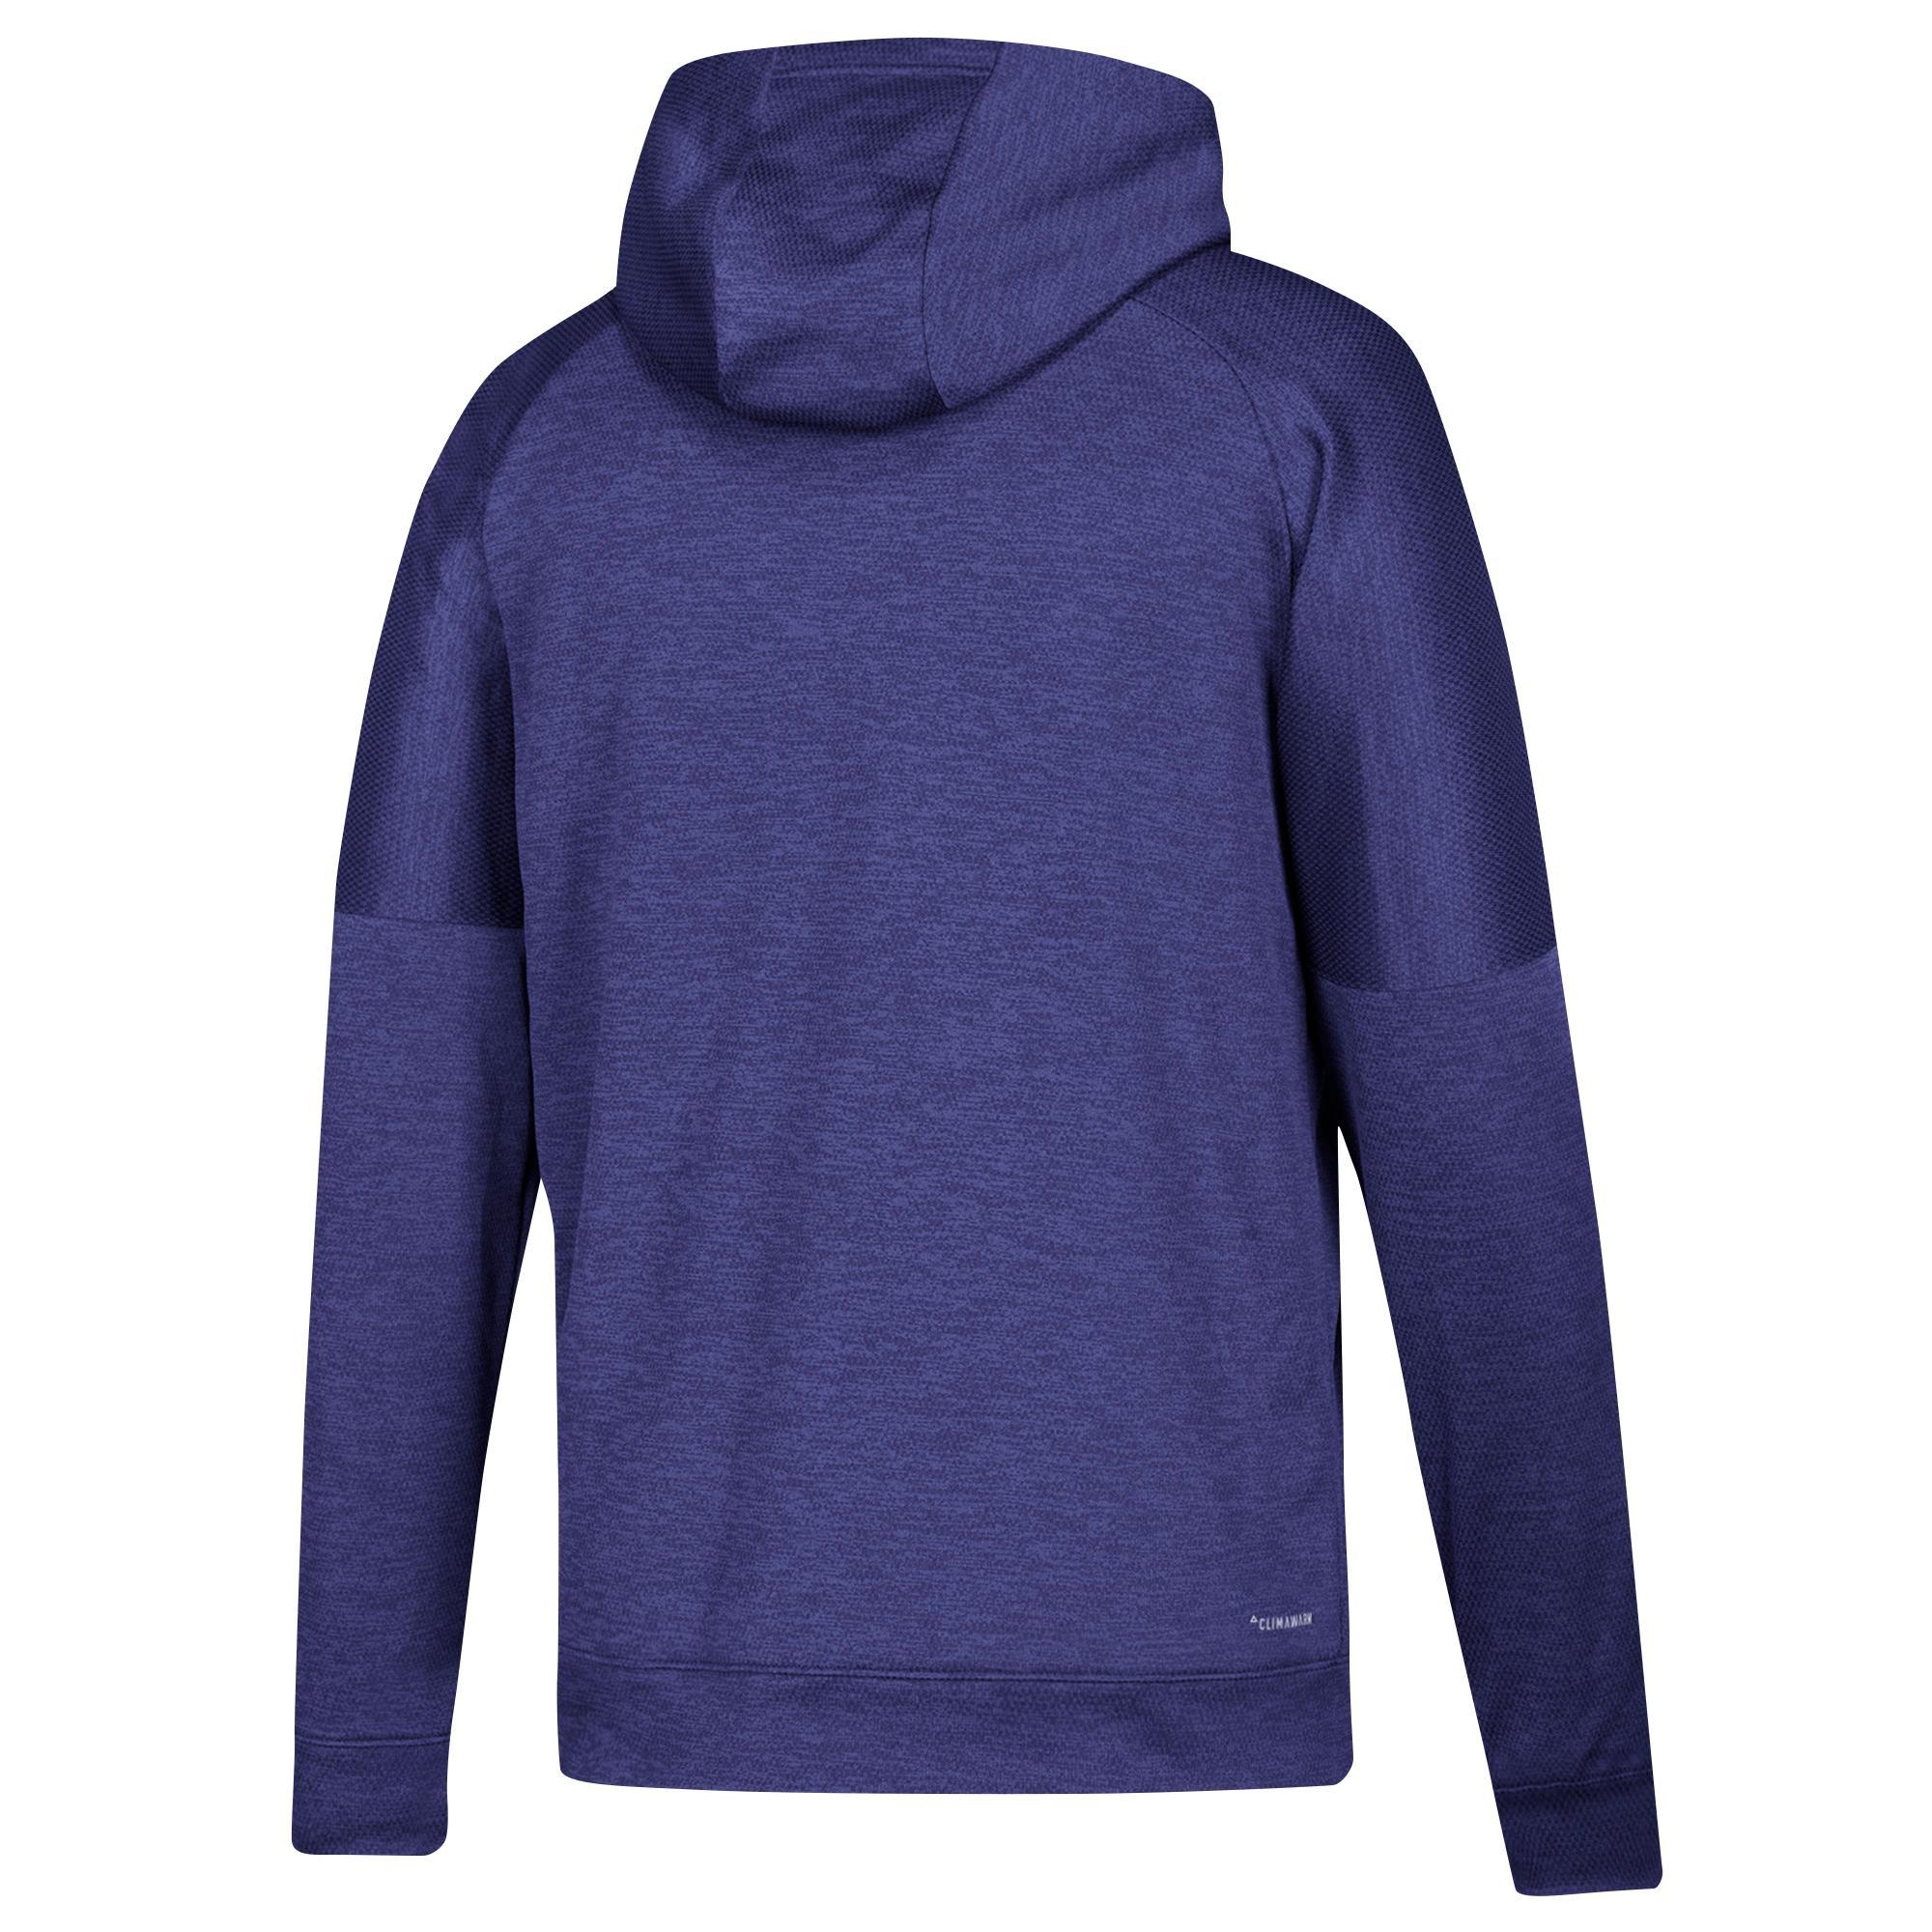 Adidas Men's Team Issue 14 Zip Fleece Pullover